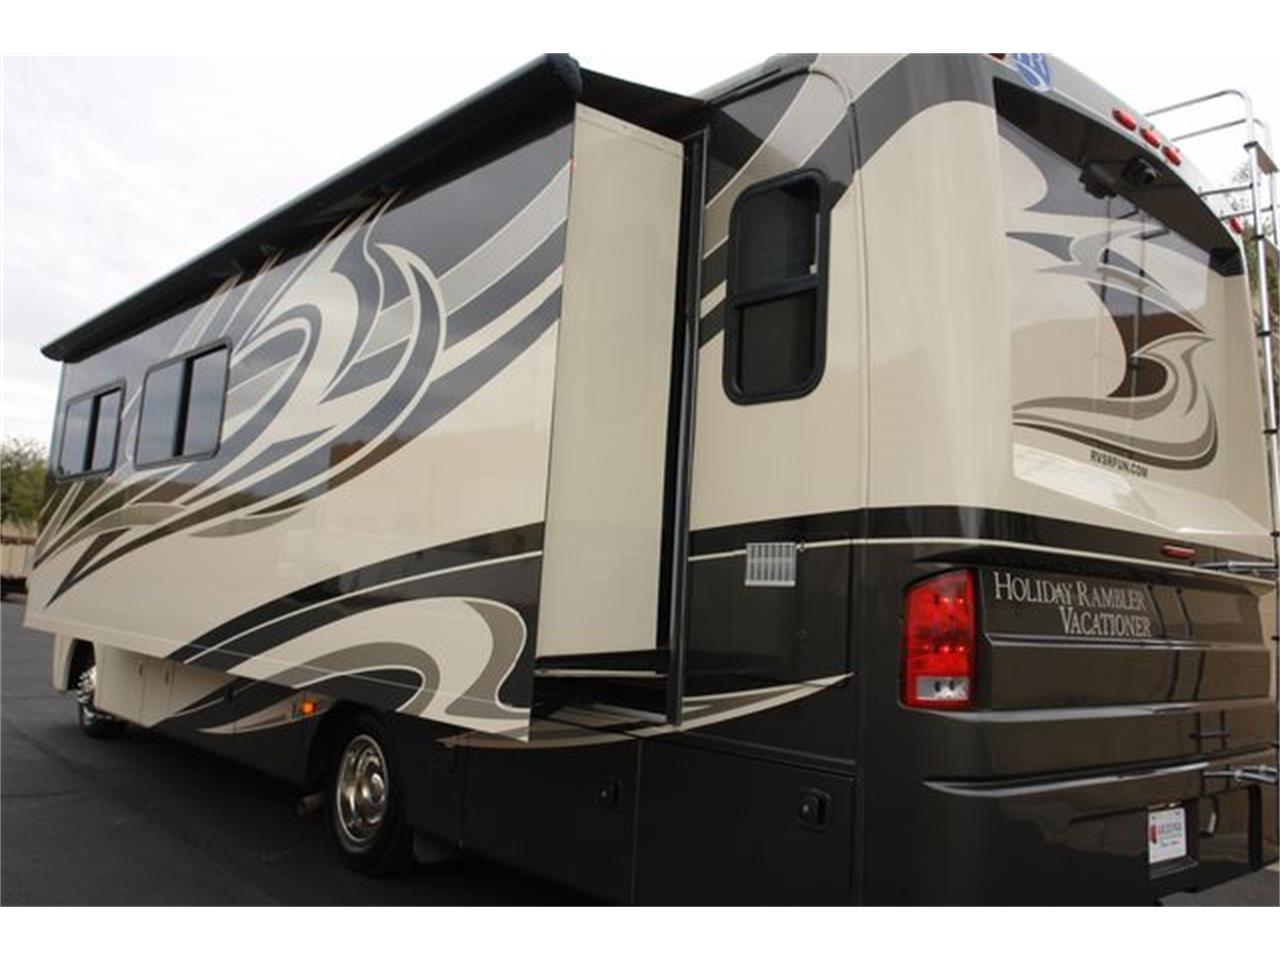 2012 Holiday Rambler Vacationer (CC-1309261) for sale in Phoenix, Arizona